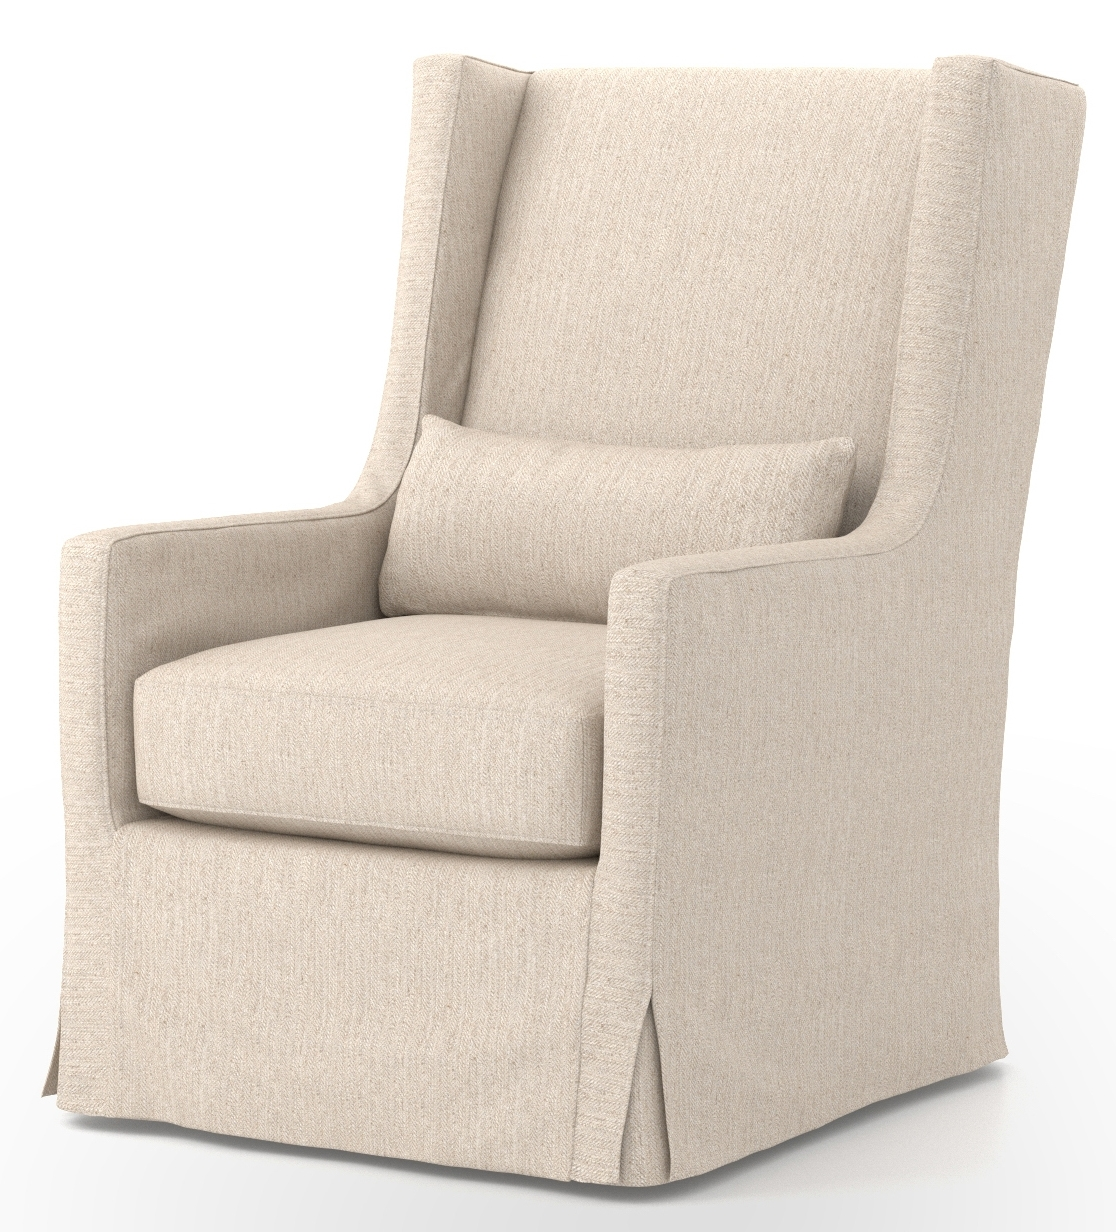 Four Hands Jette Linen Swivel Wing Chair Cken C2 362